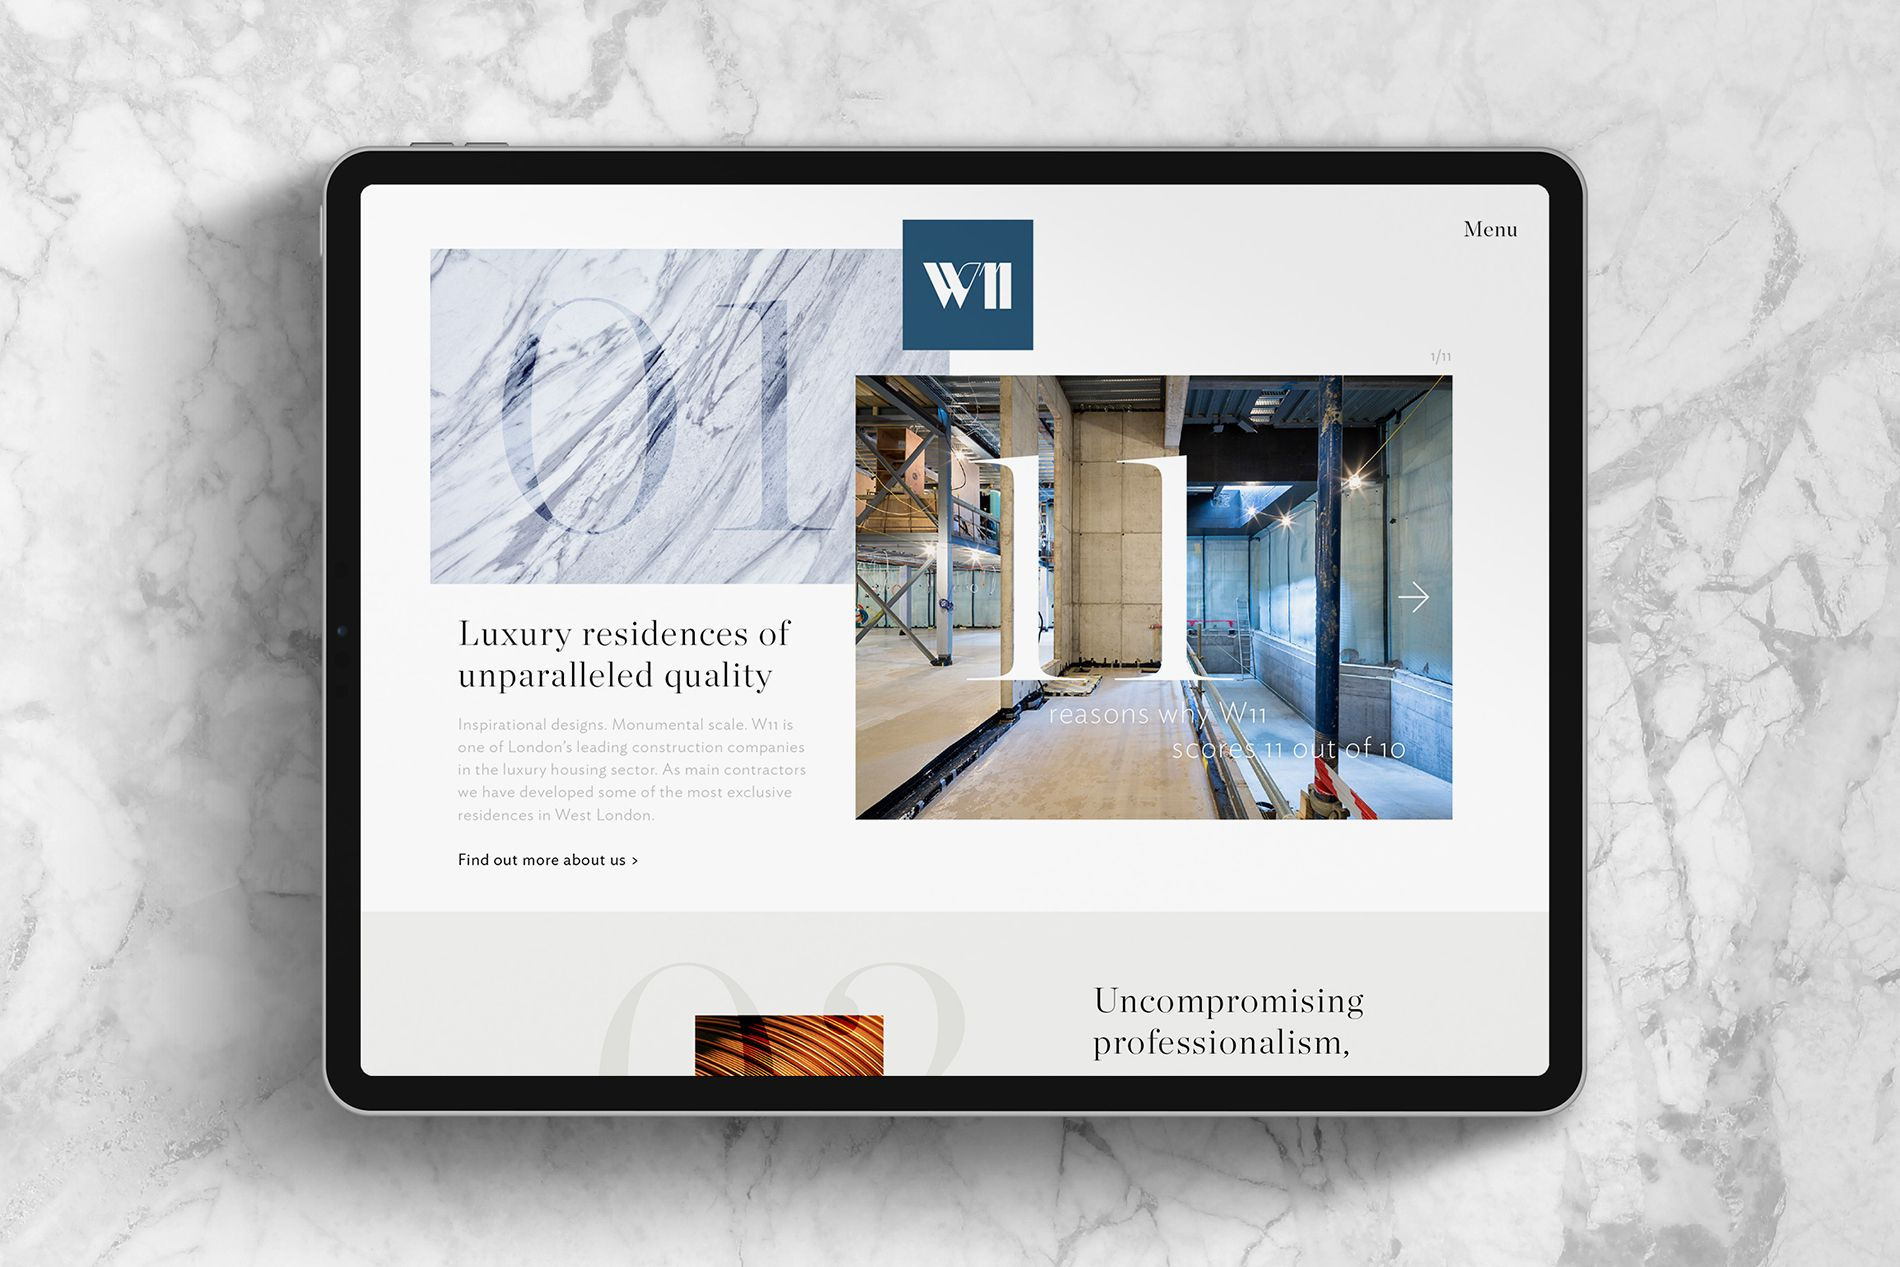 Luxury Digital Branding Agency in London